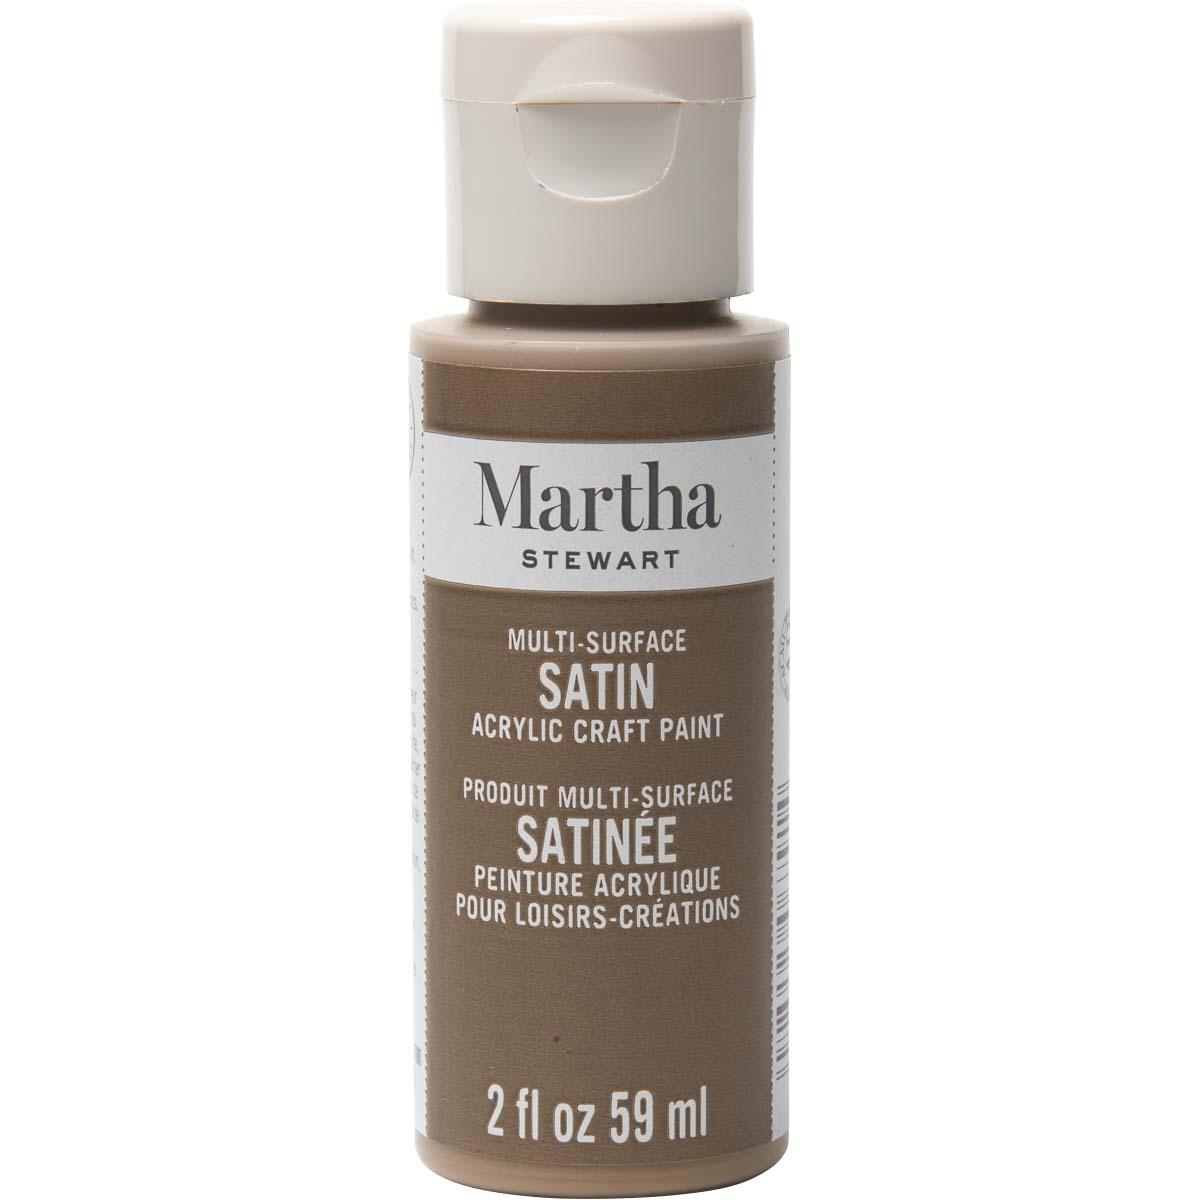 Martha Stewart® 2oz Multi-Surface Satin Acrylic Craft Paint - Sycamore Bark